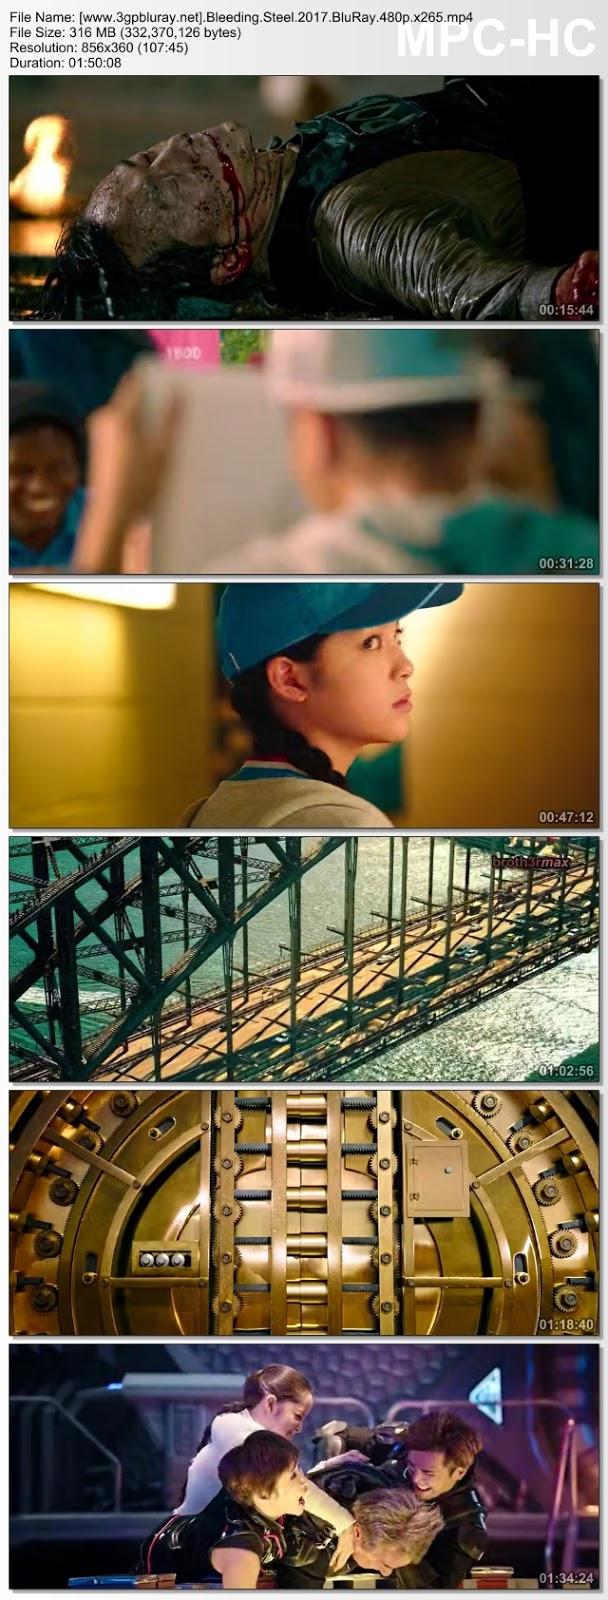 Screenshots Download Bleeding Steel (2017) BluRay 480p & 3GP Subtitle Indonesia